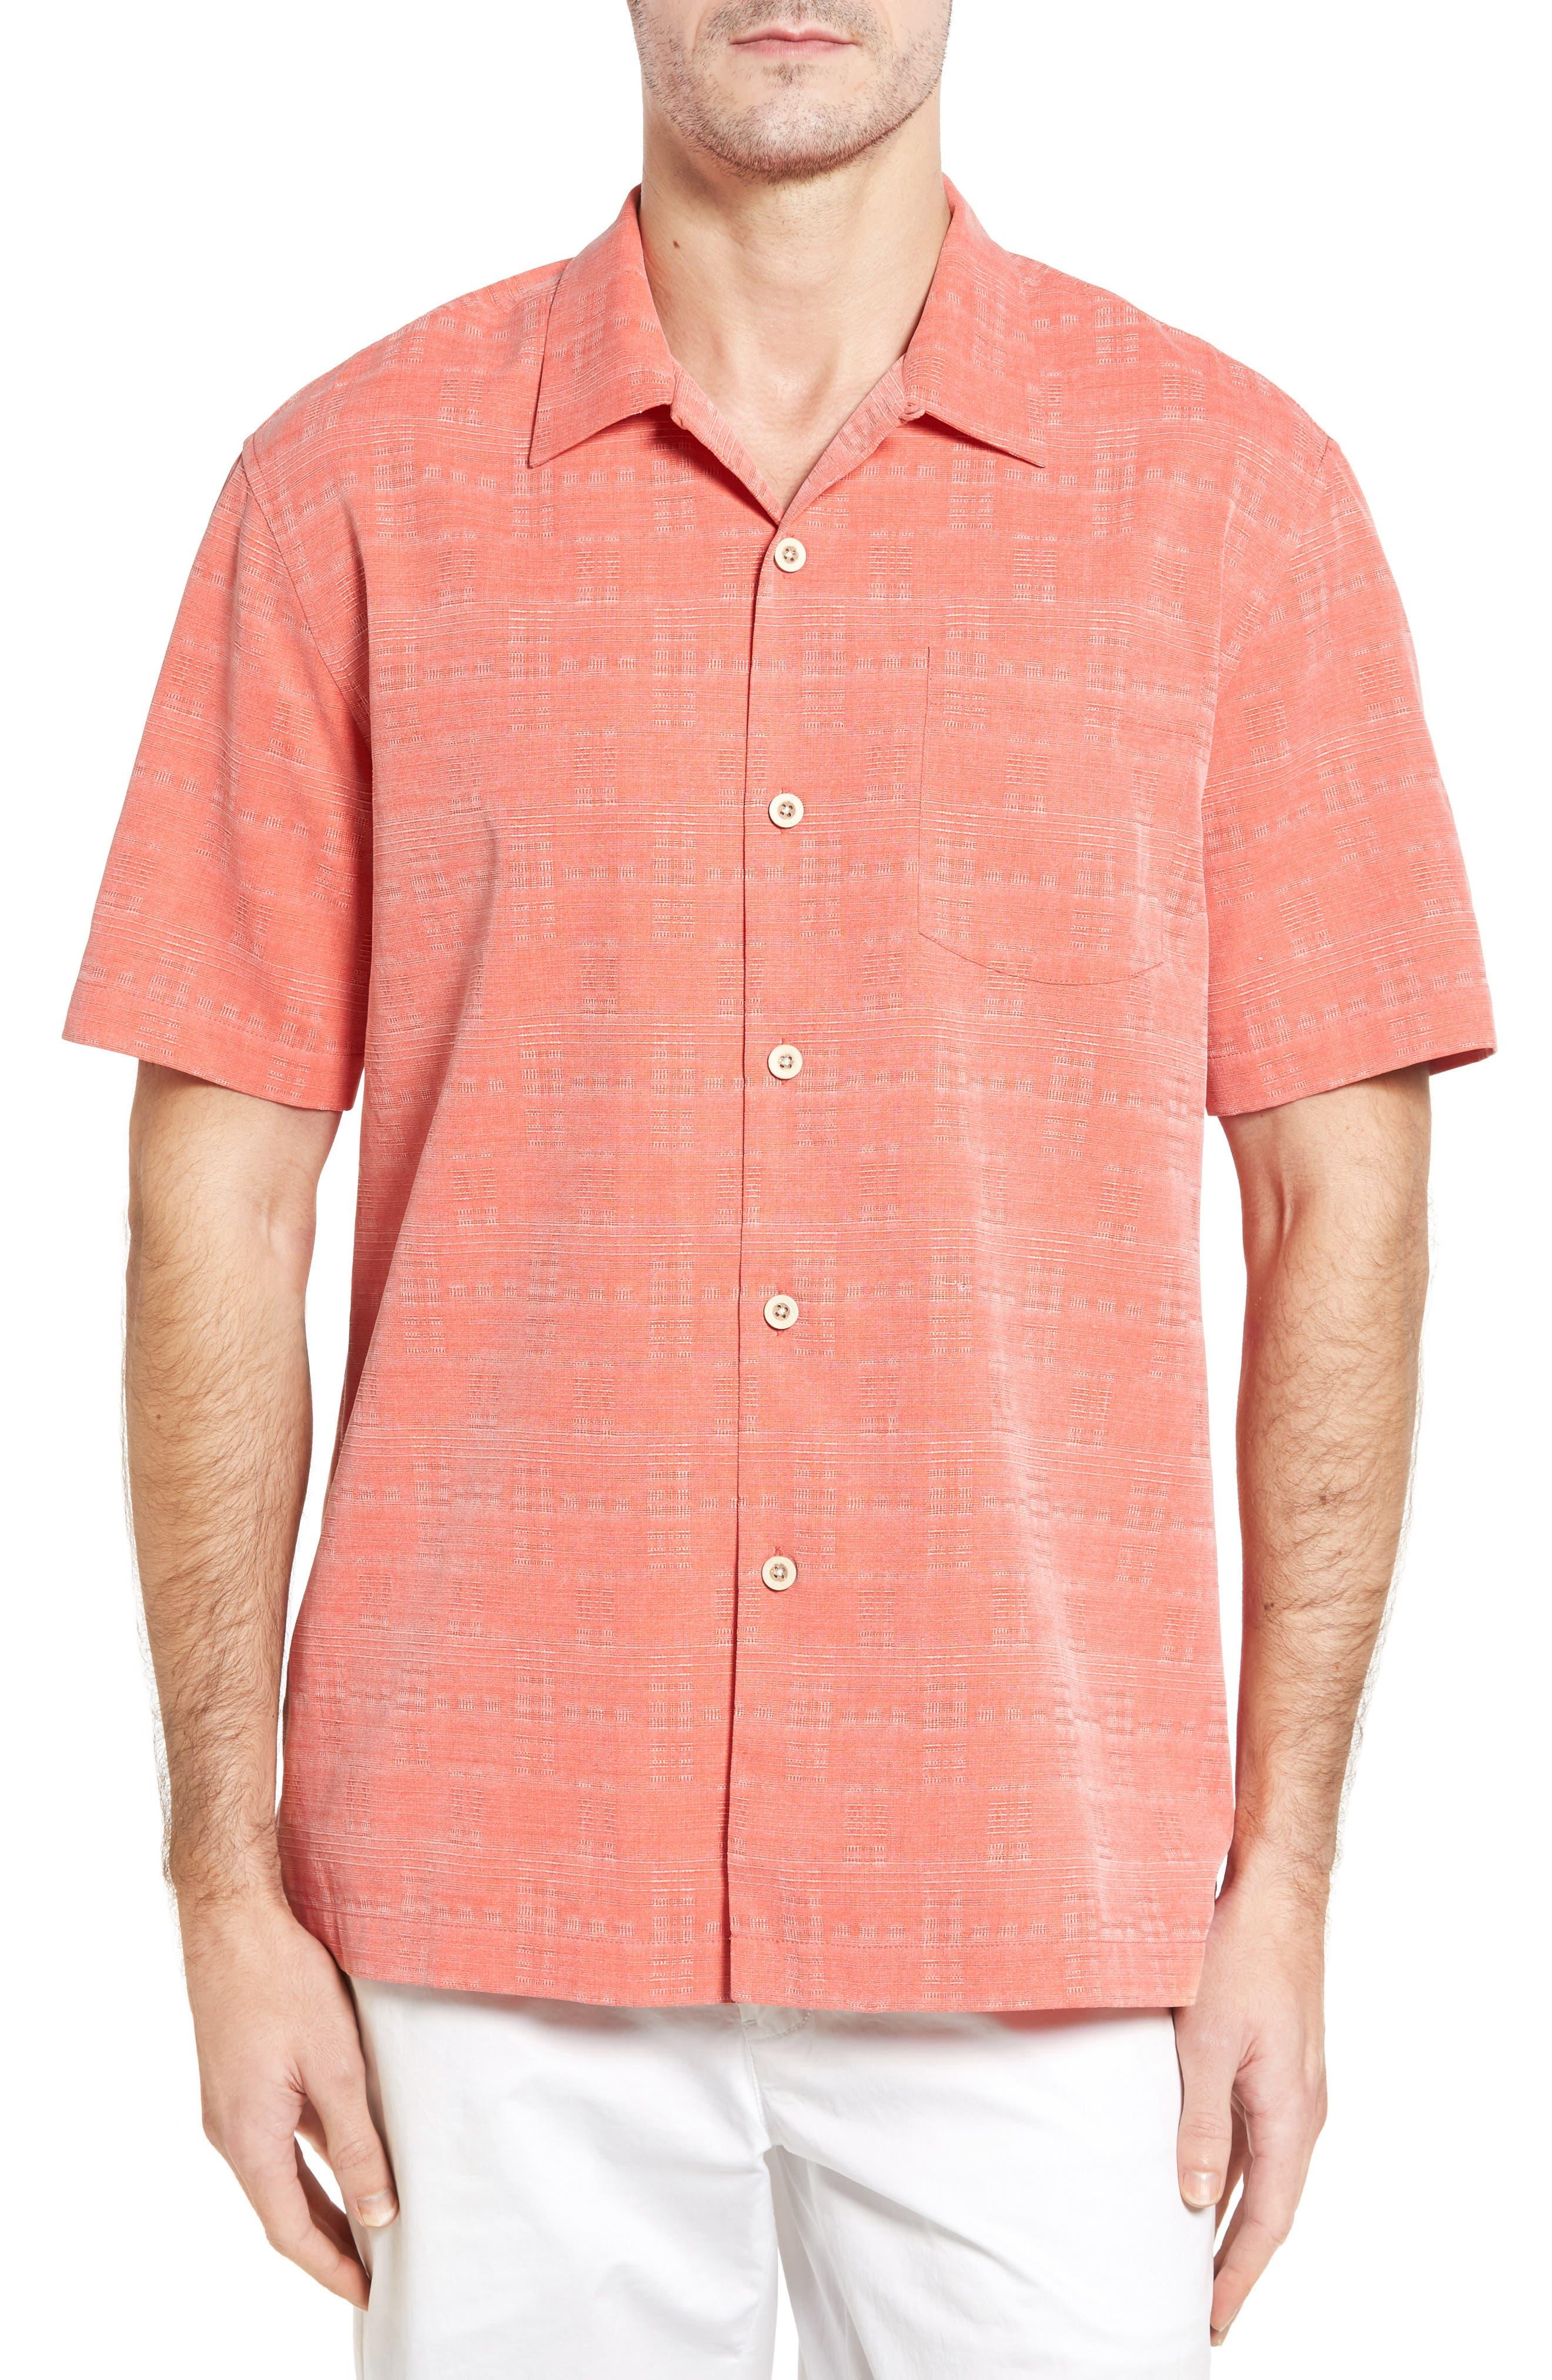 Main Image - Tommy Bahama Original Fit Jacquard Silk Camp Shirt